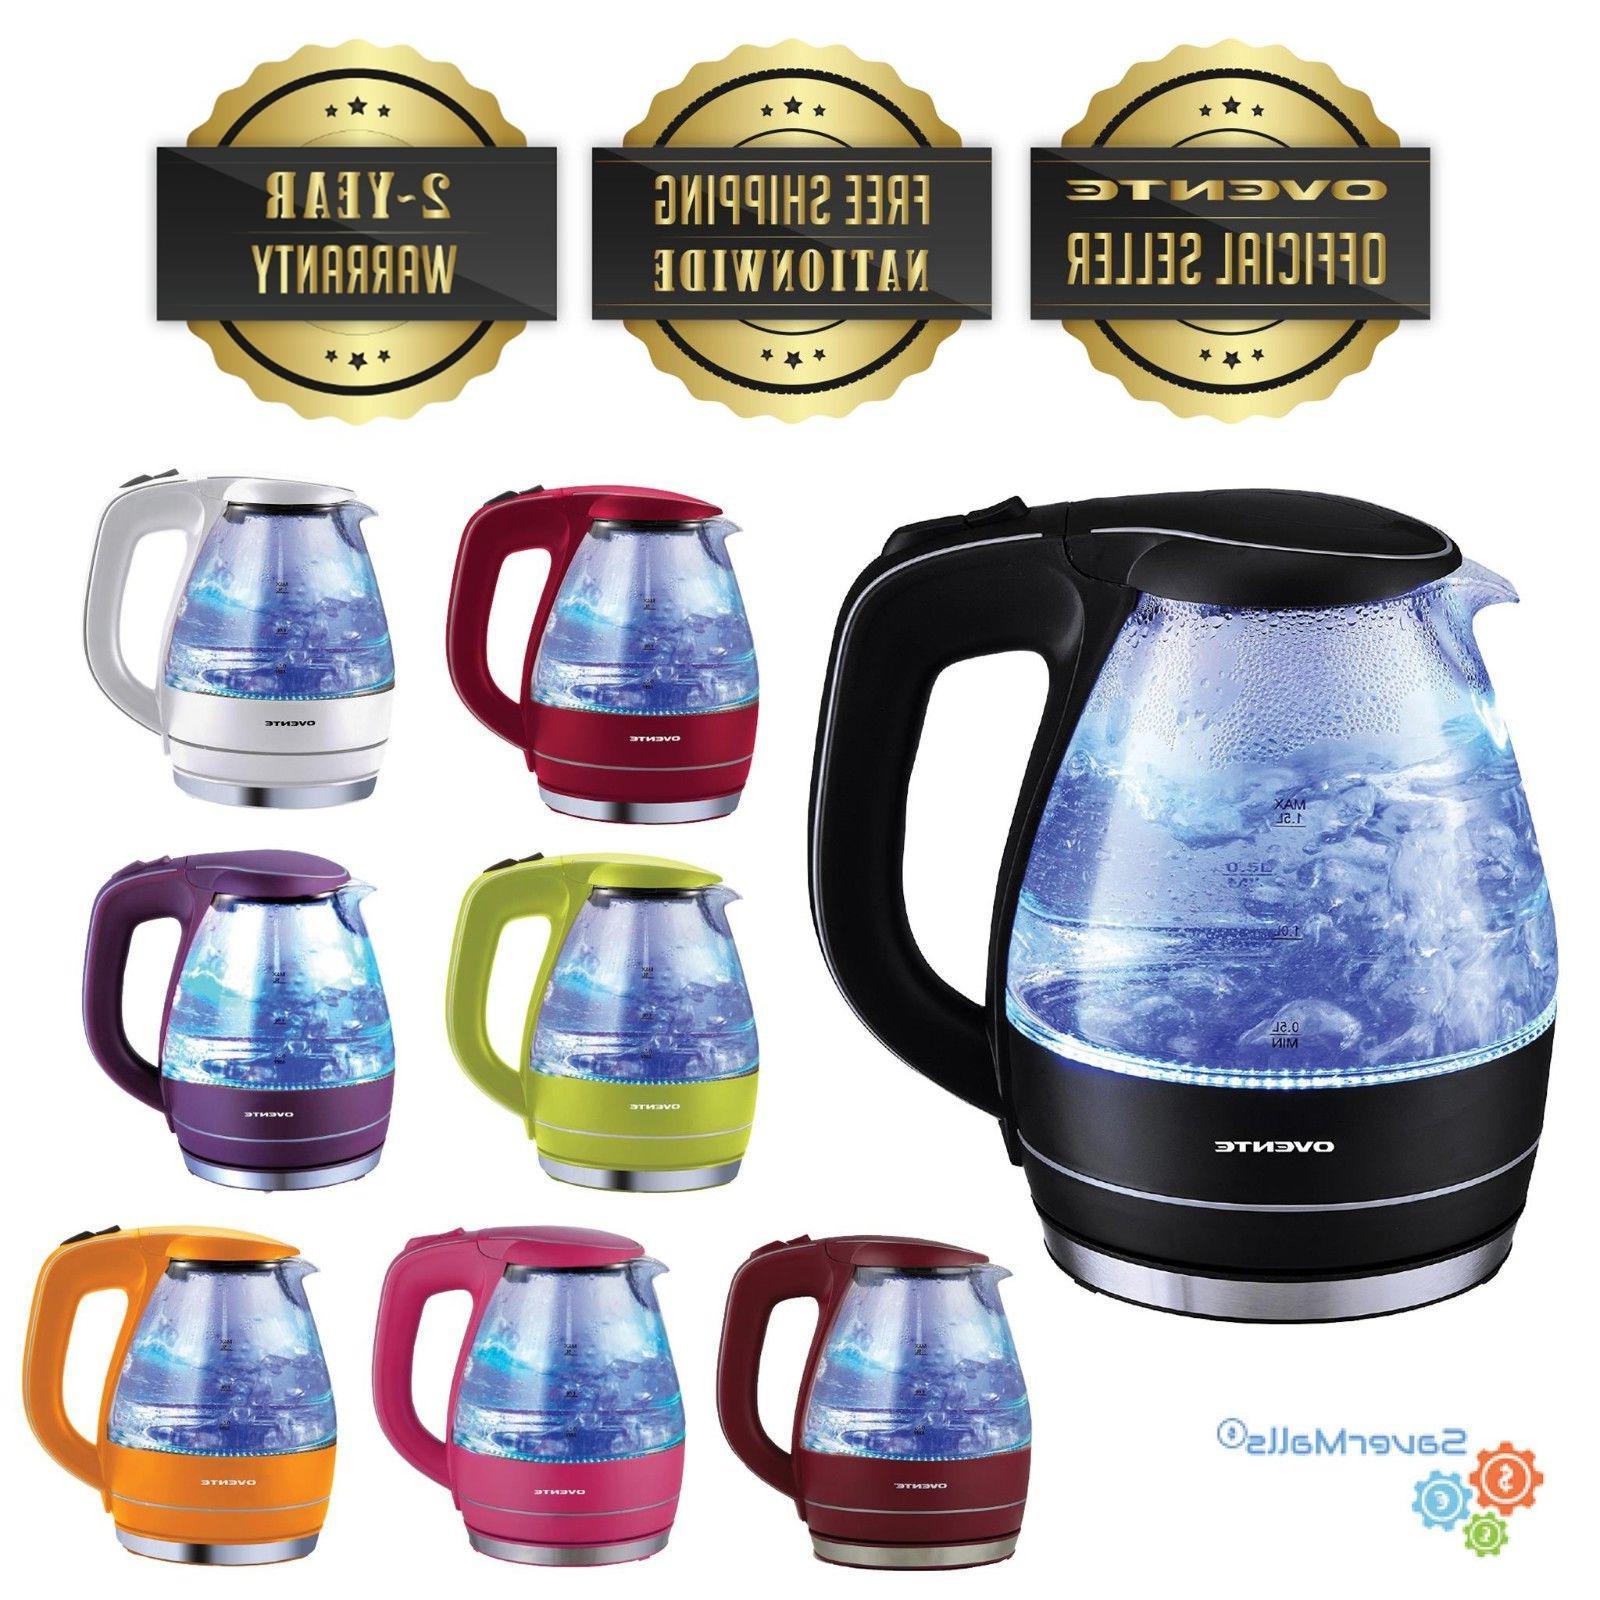 kg83 1 5l glass cordless electric kettle